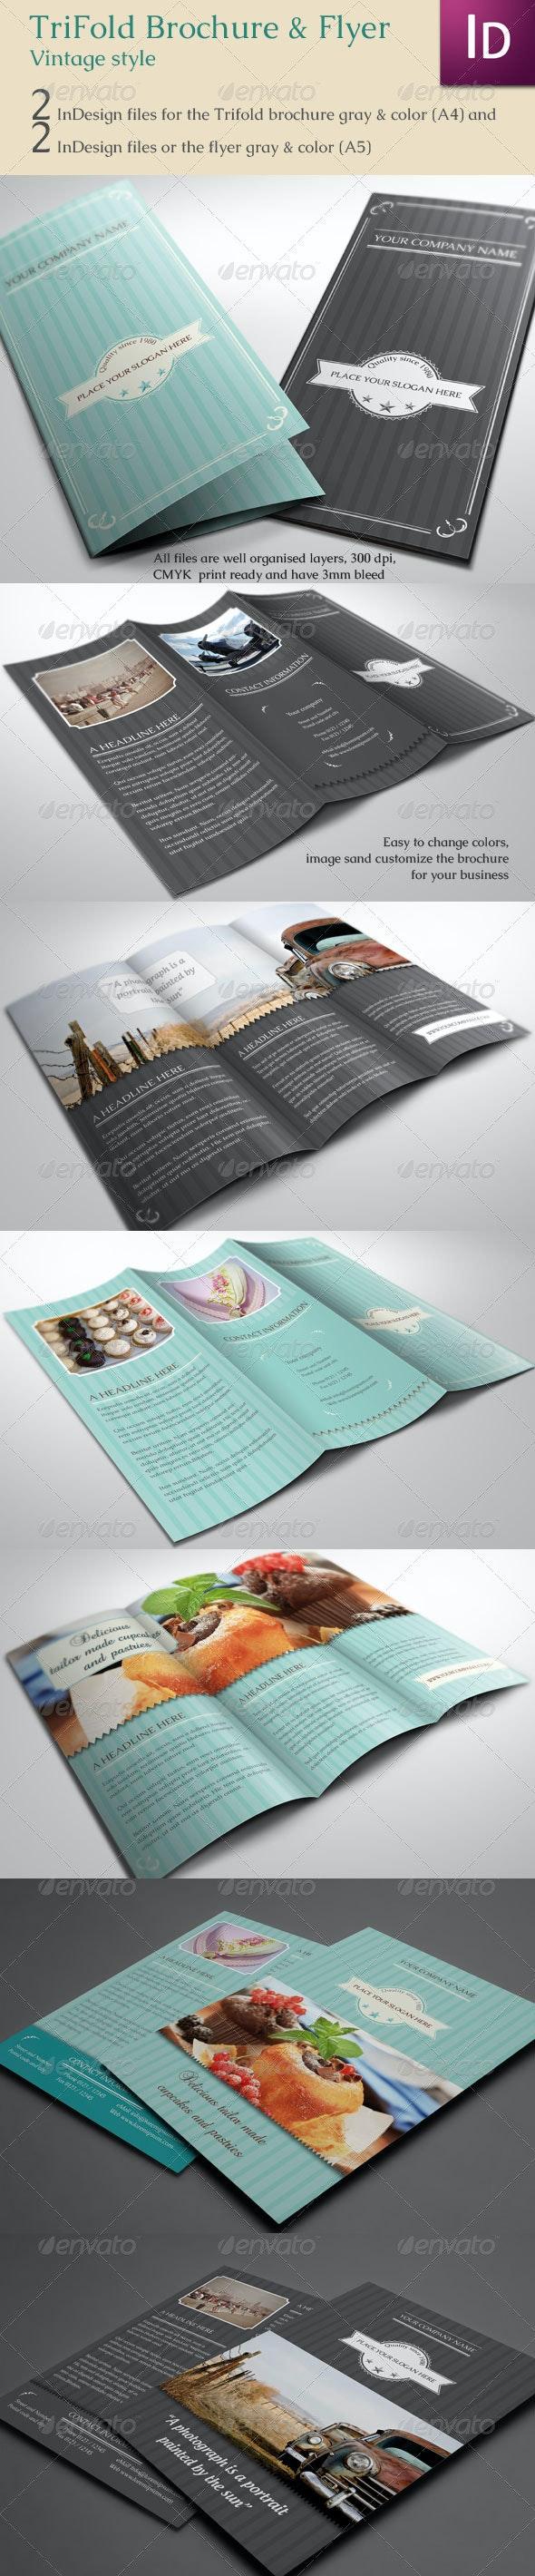 Trifold Brochure & Flyer Vintage - Corporate Brochures